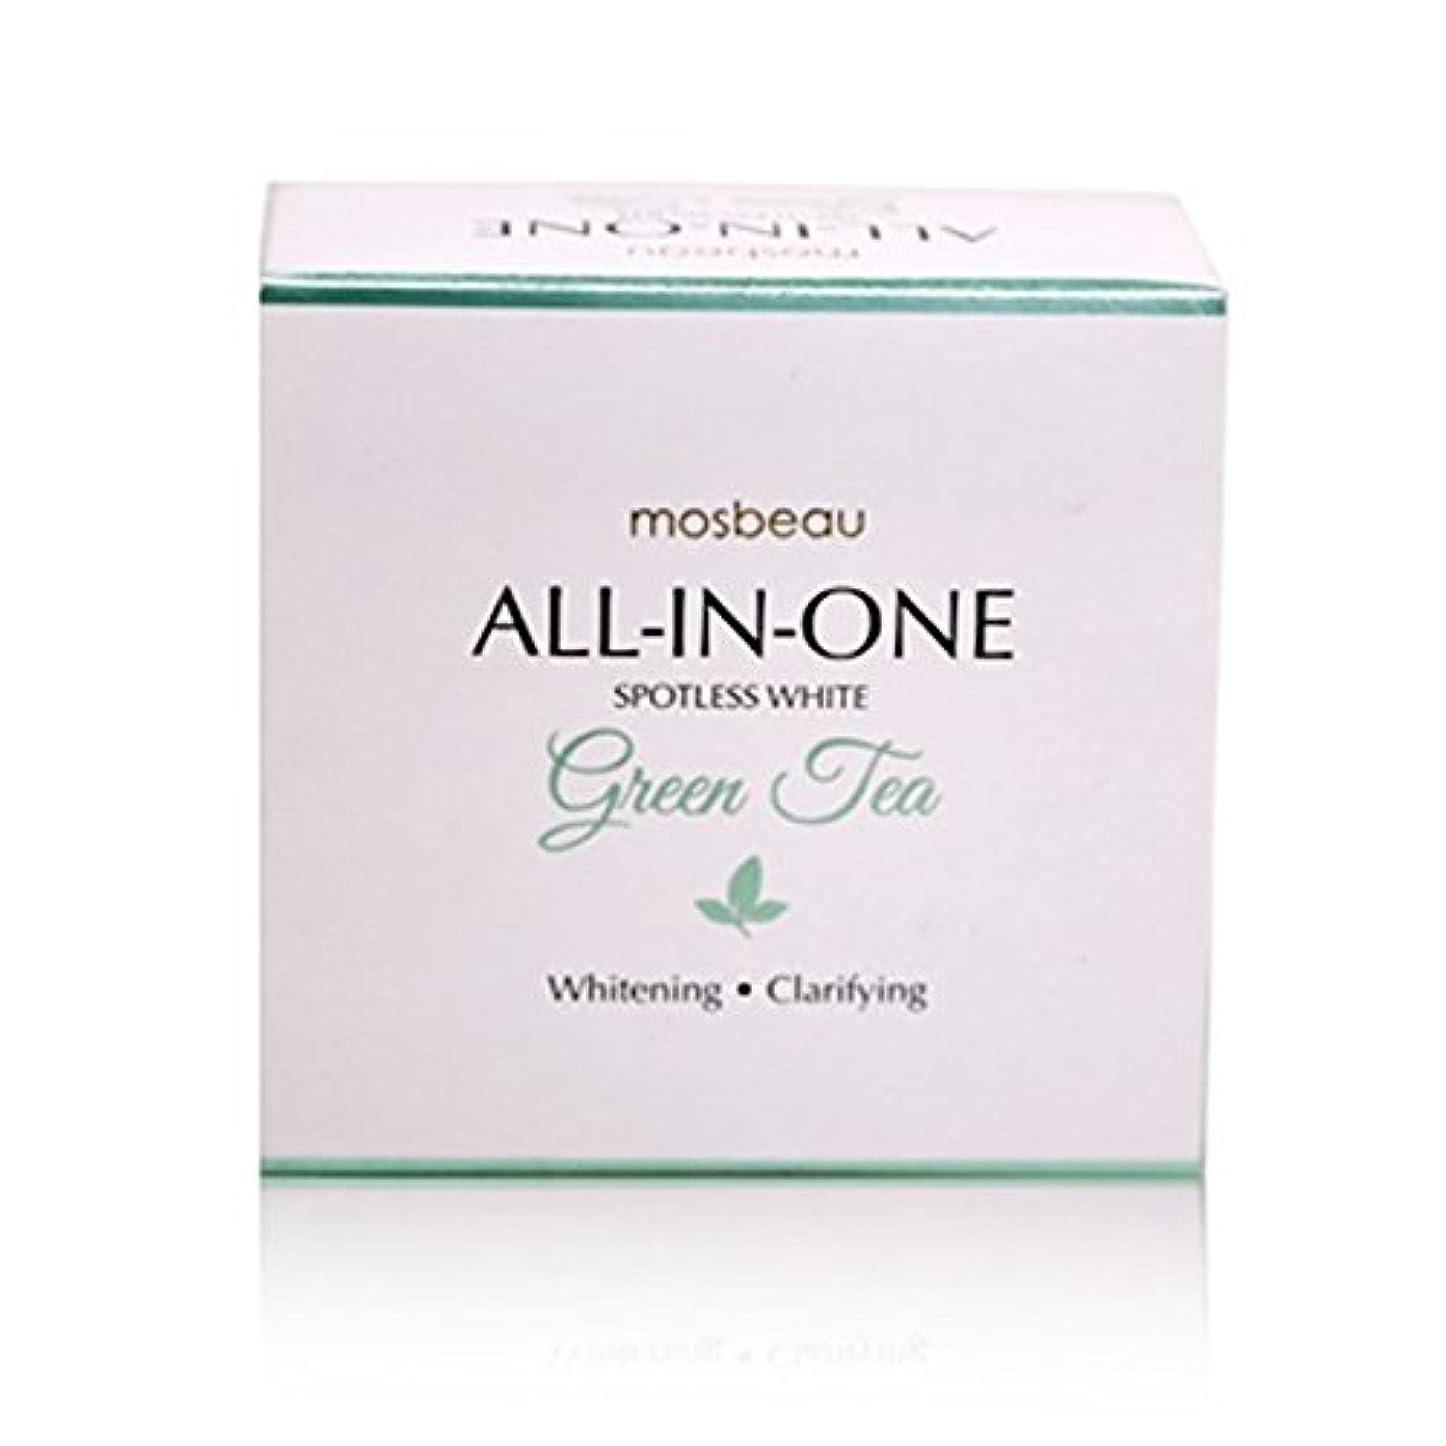 mosbeau Spotless White GREEN TEA Facial Soap 100g モスビュー スポットレス ホワイト グリーンティー フェイシャル ソープ